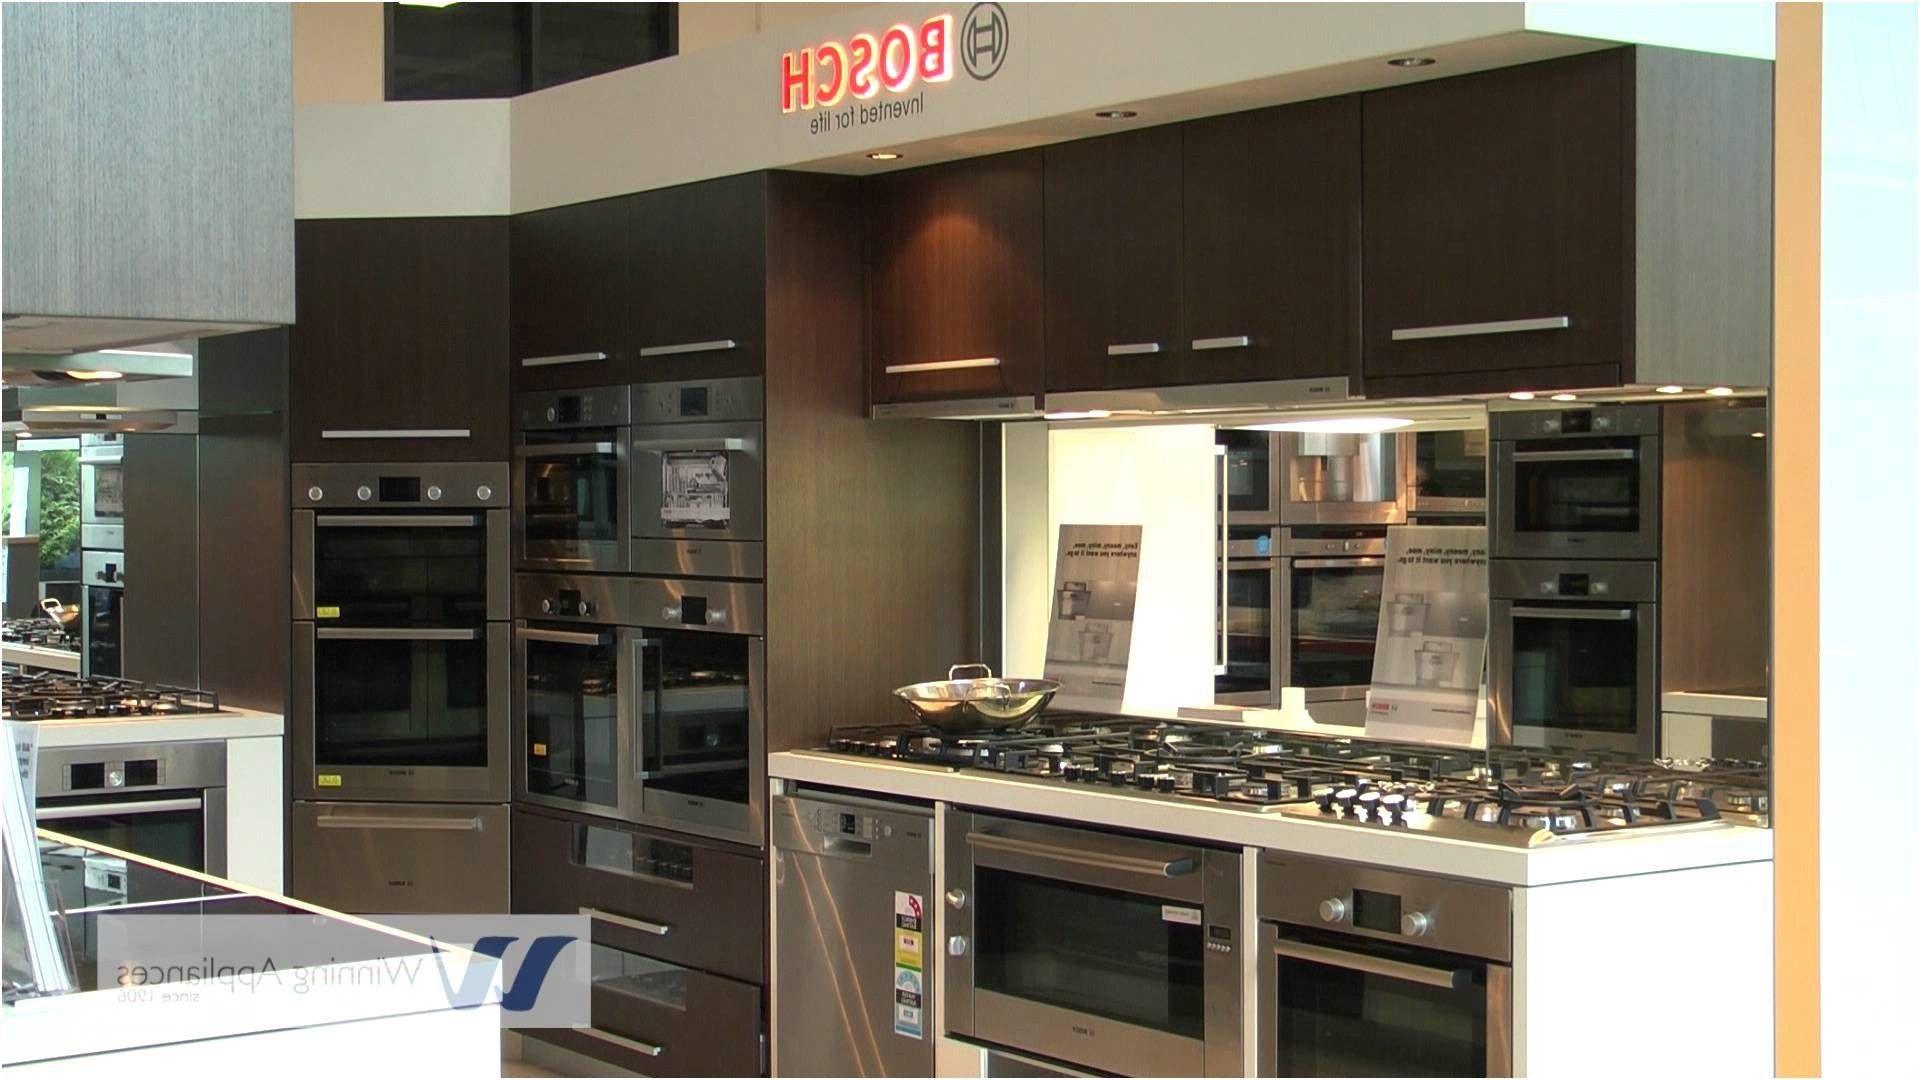 The Latest Kitchen Appliance Trends Winning Appliances Youtube From Latest  Trends In Kitchen Appliances